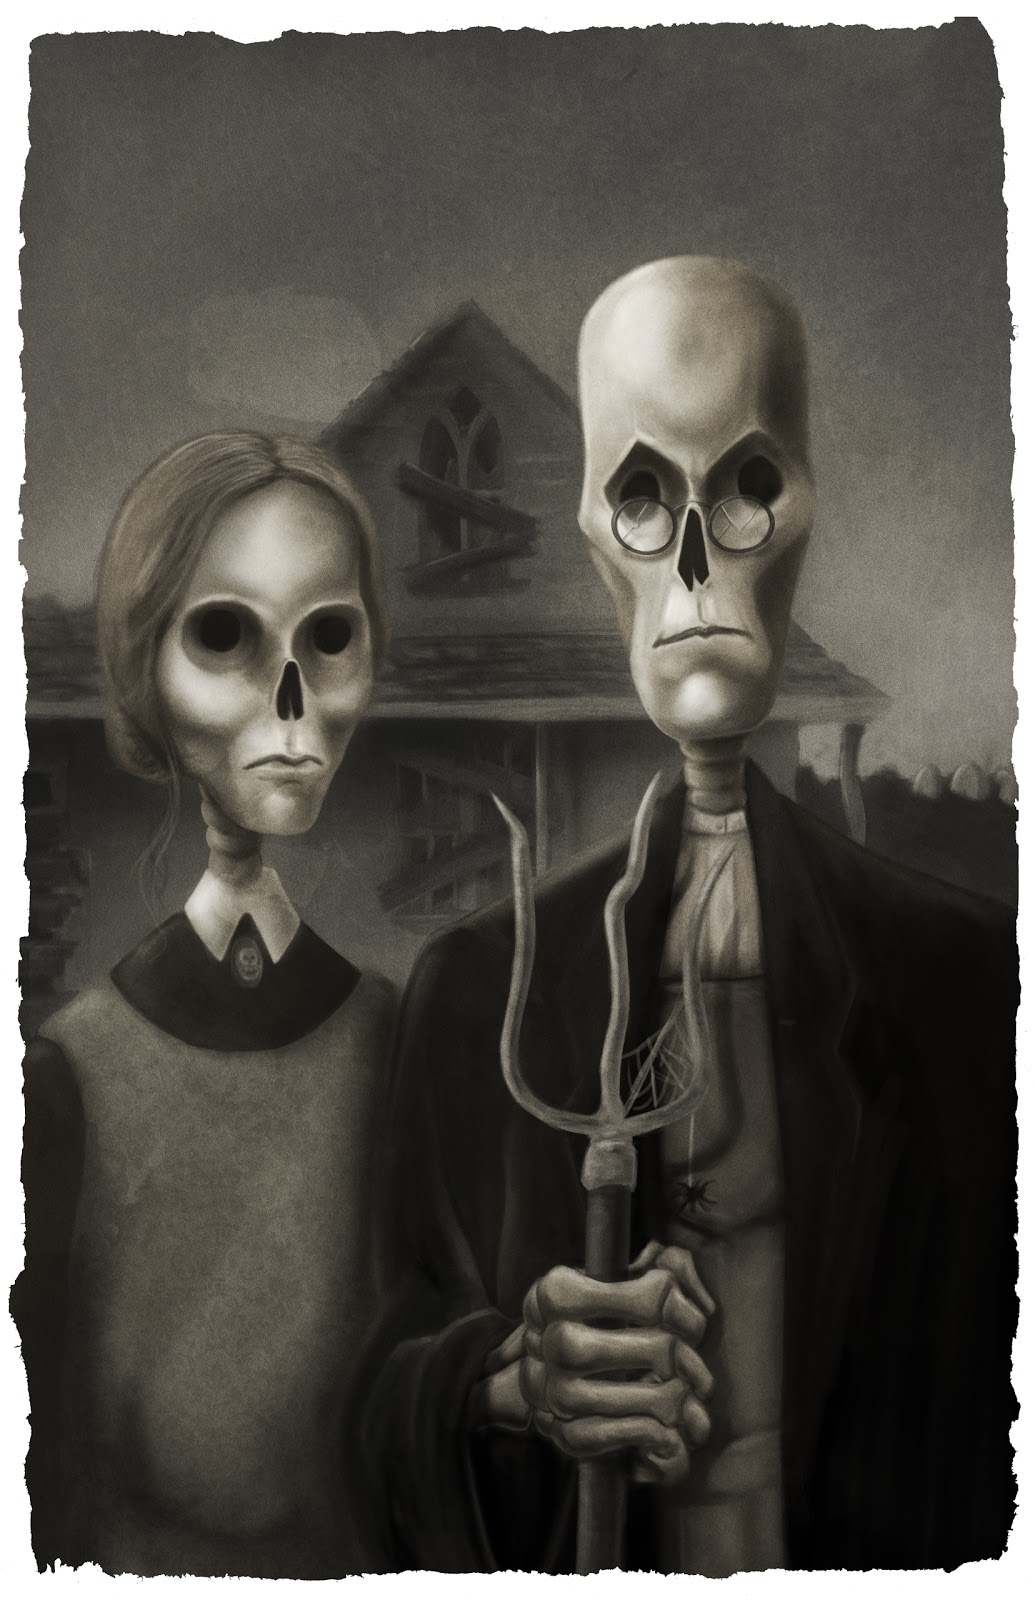 http://3.bp.blogspot.com/-NTo6w56PSzw/TzBLieEjnVI/AAAAAAAAAYU/ZVOfCqq3324/s1600/american-gothic_final.jpg